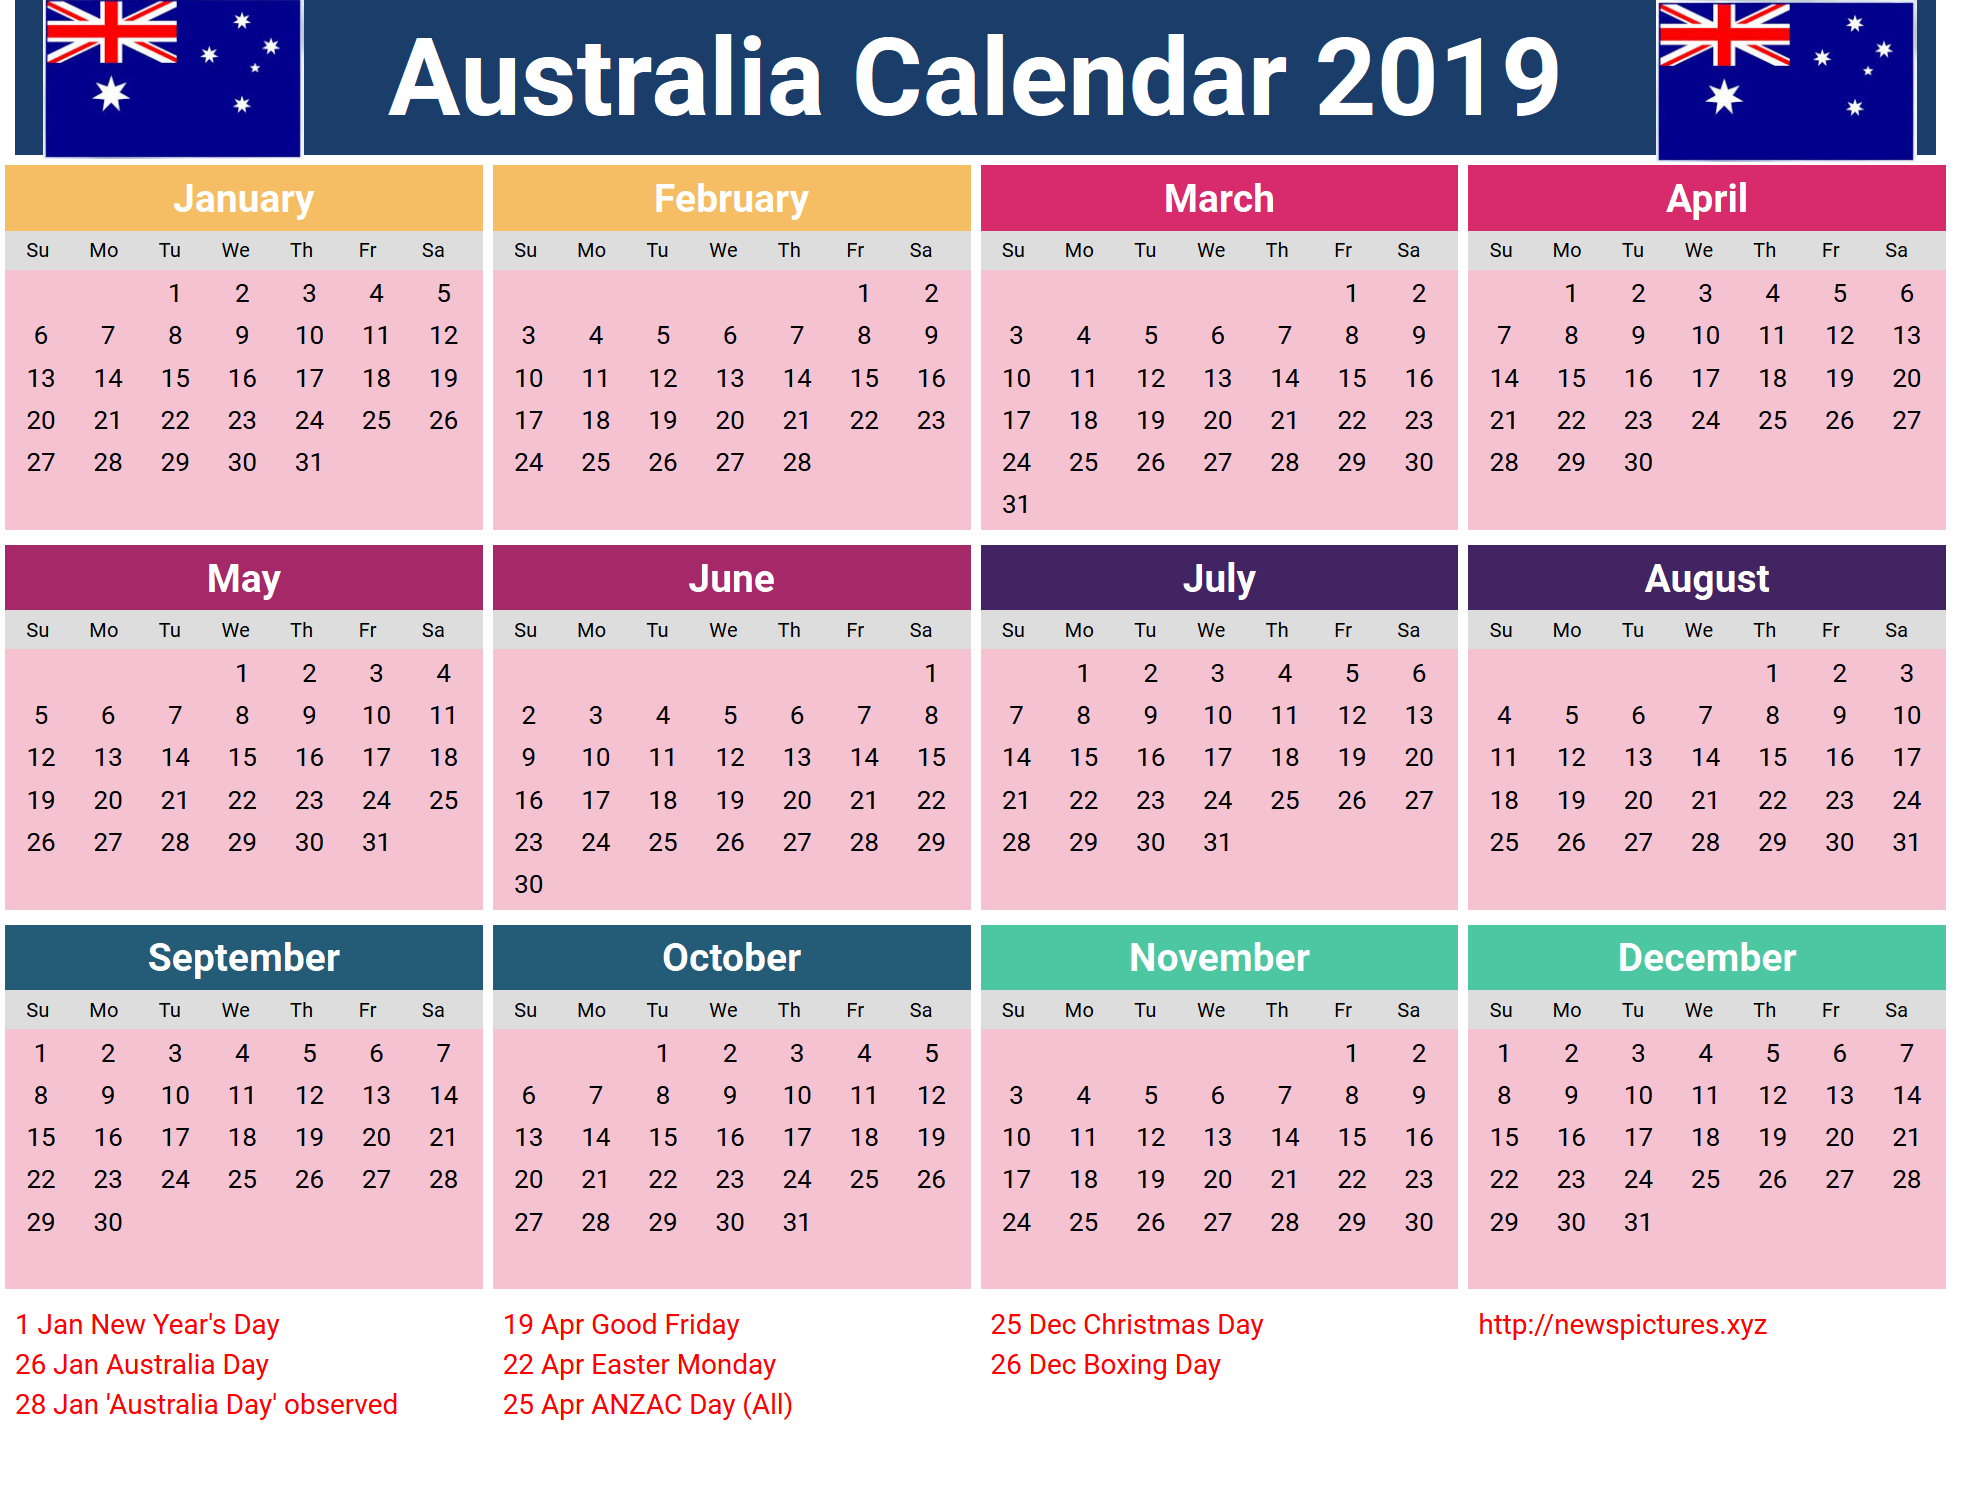 United Kingdom 2019 Holidays Calendar | Monthly Calendar Templates Calendar 2019 Printable Holidays